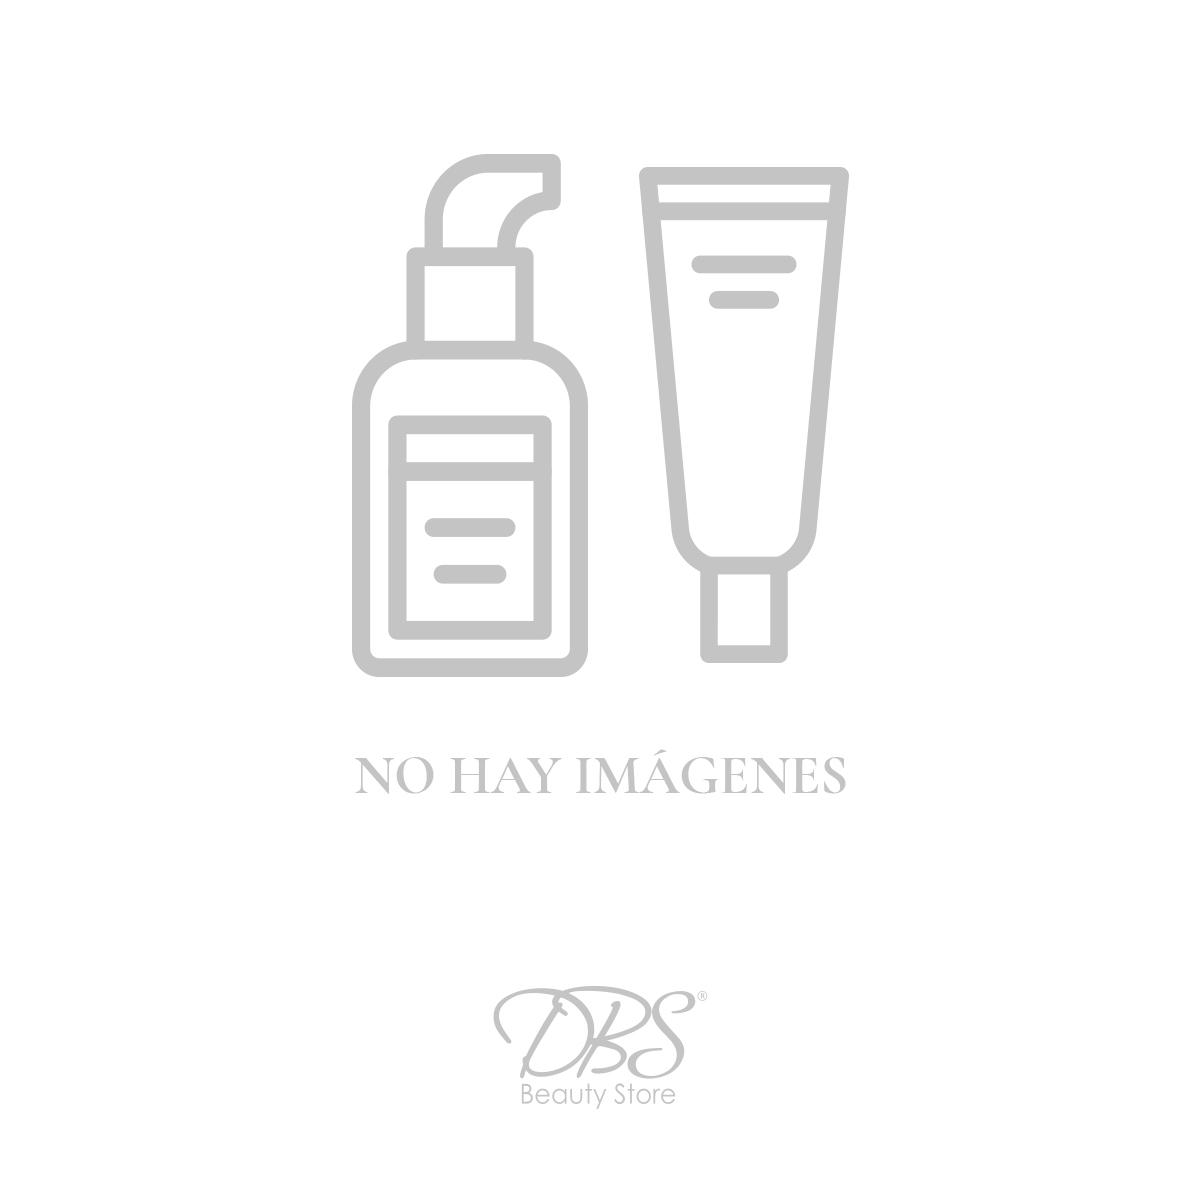 makeup-revolution-RT-31523.jpg